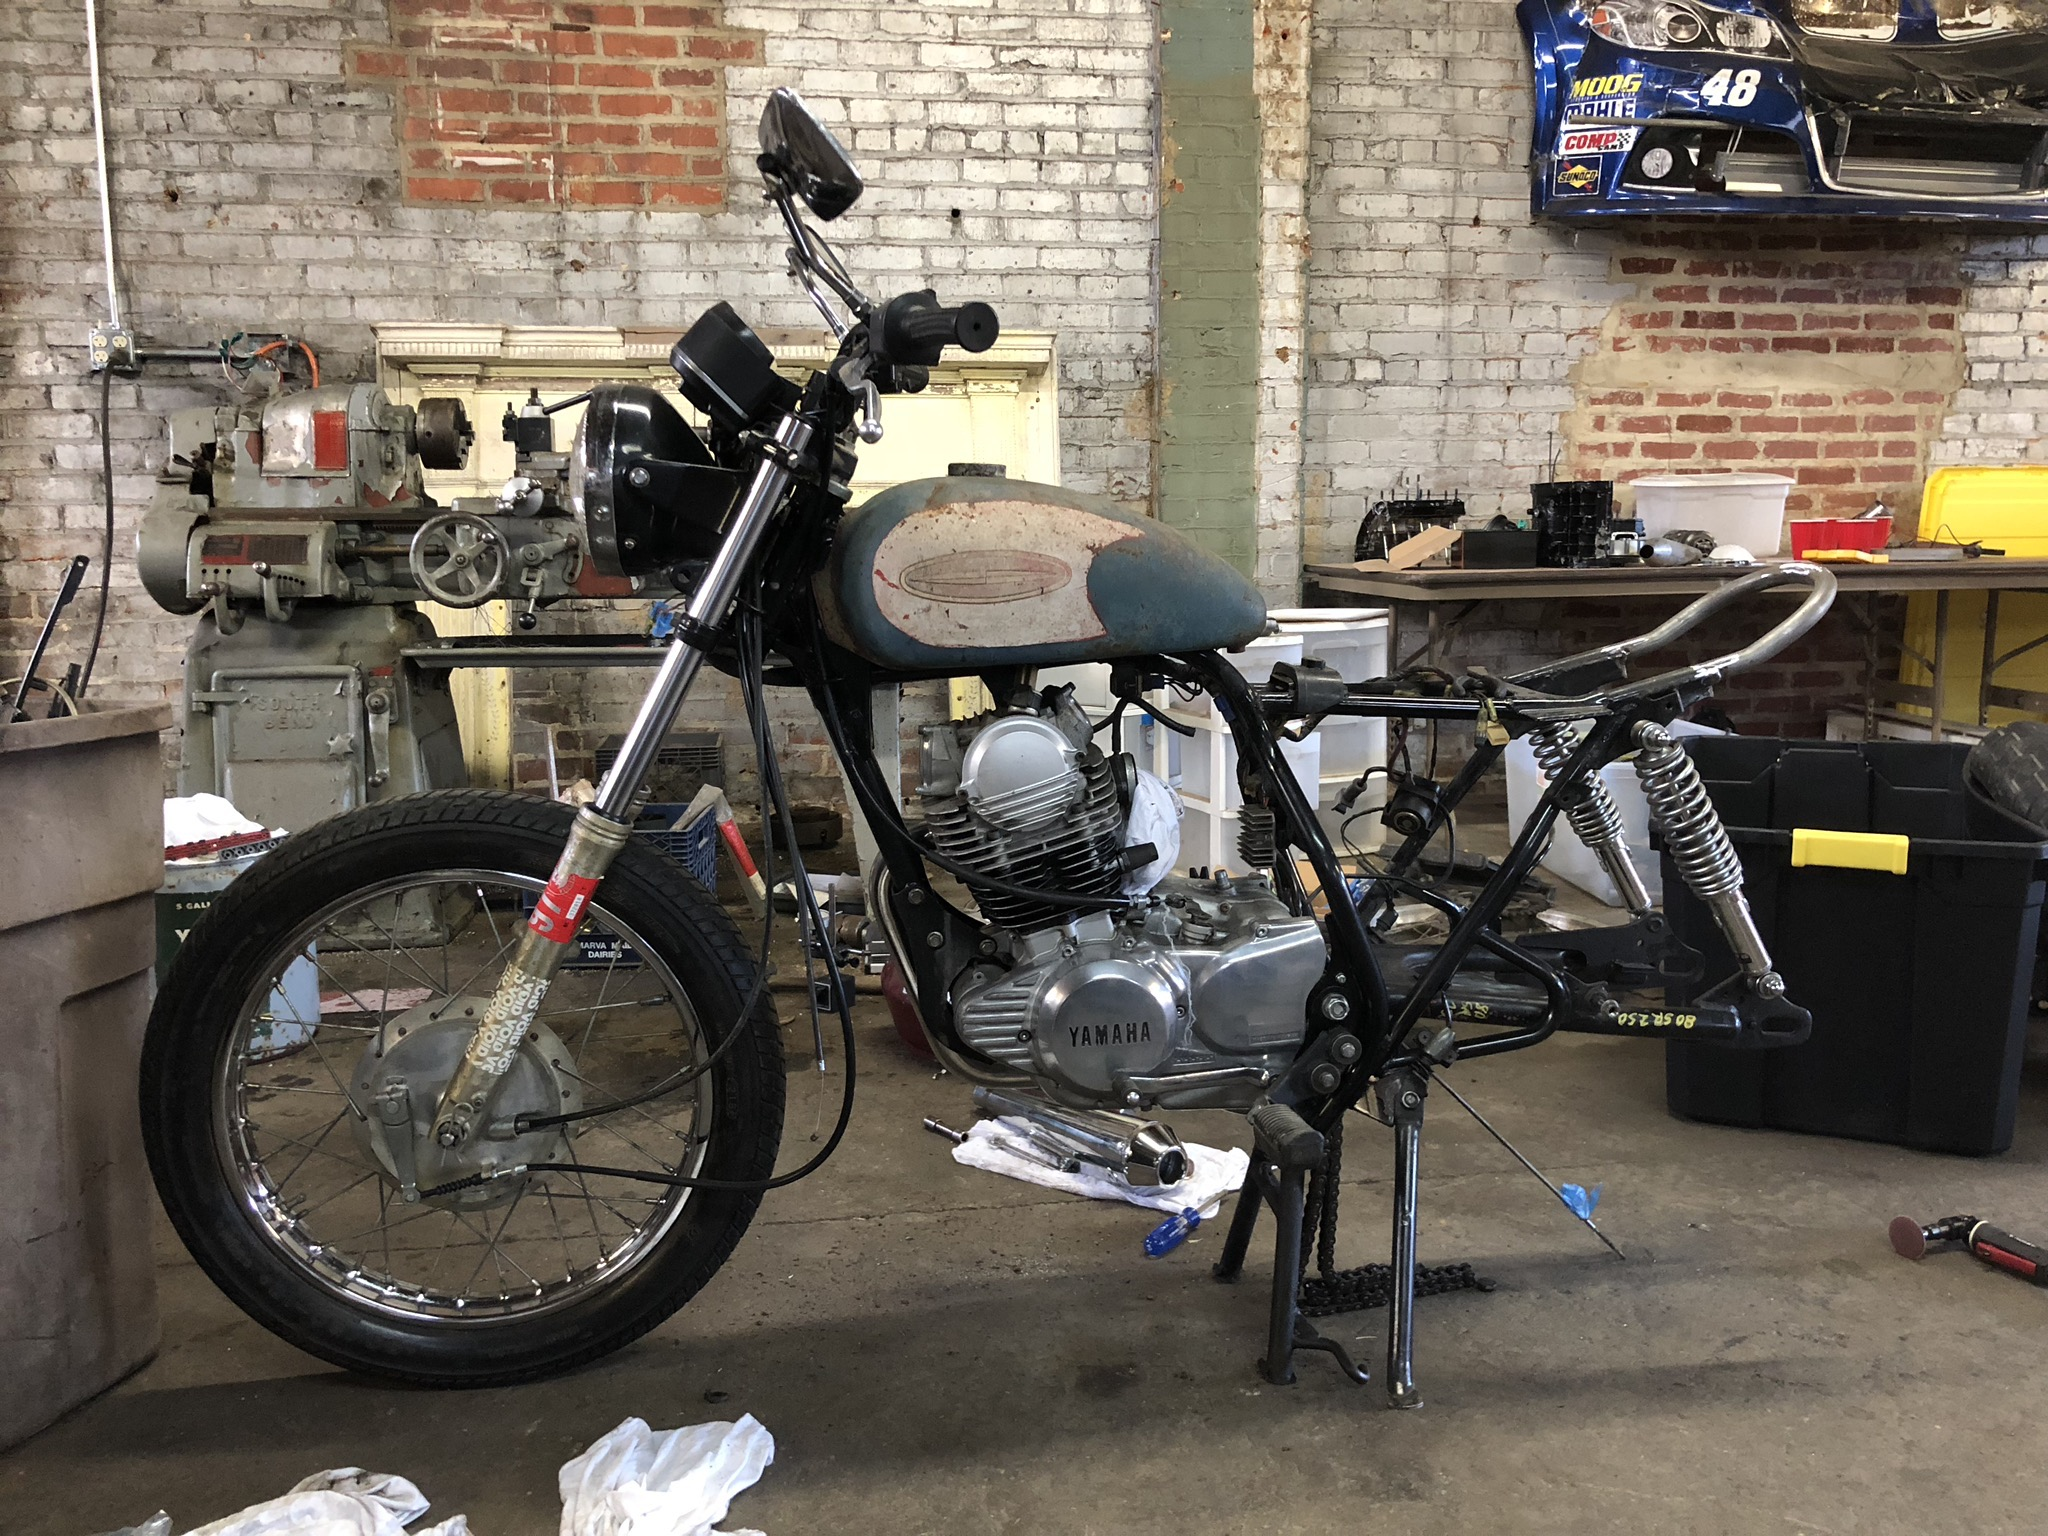 1982 Yamaha SR250 – The Exciter